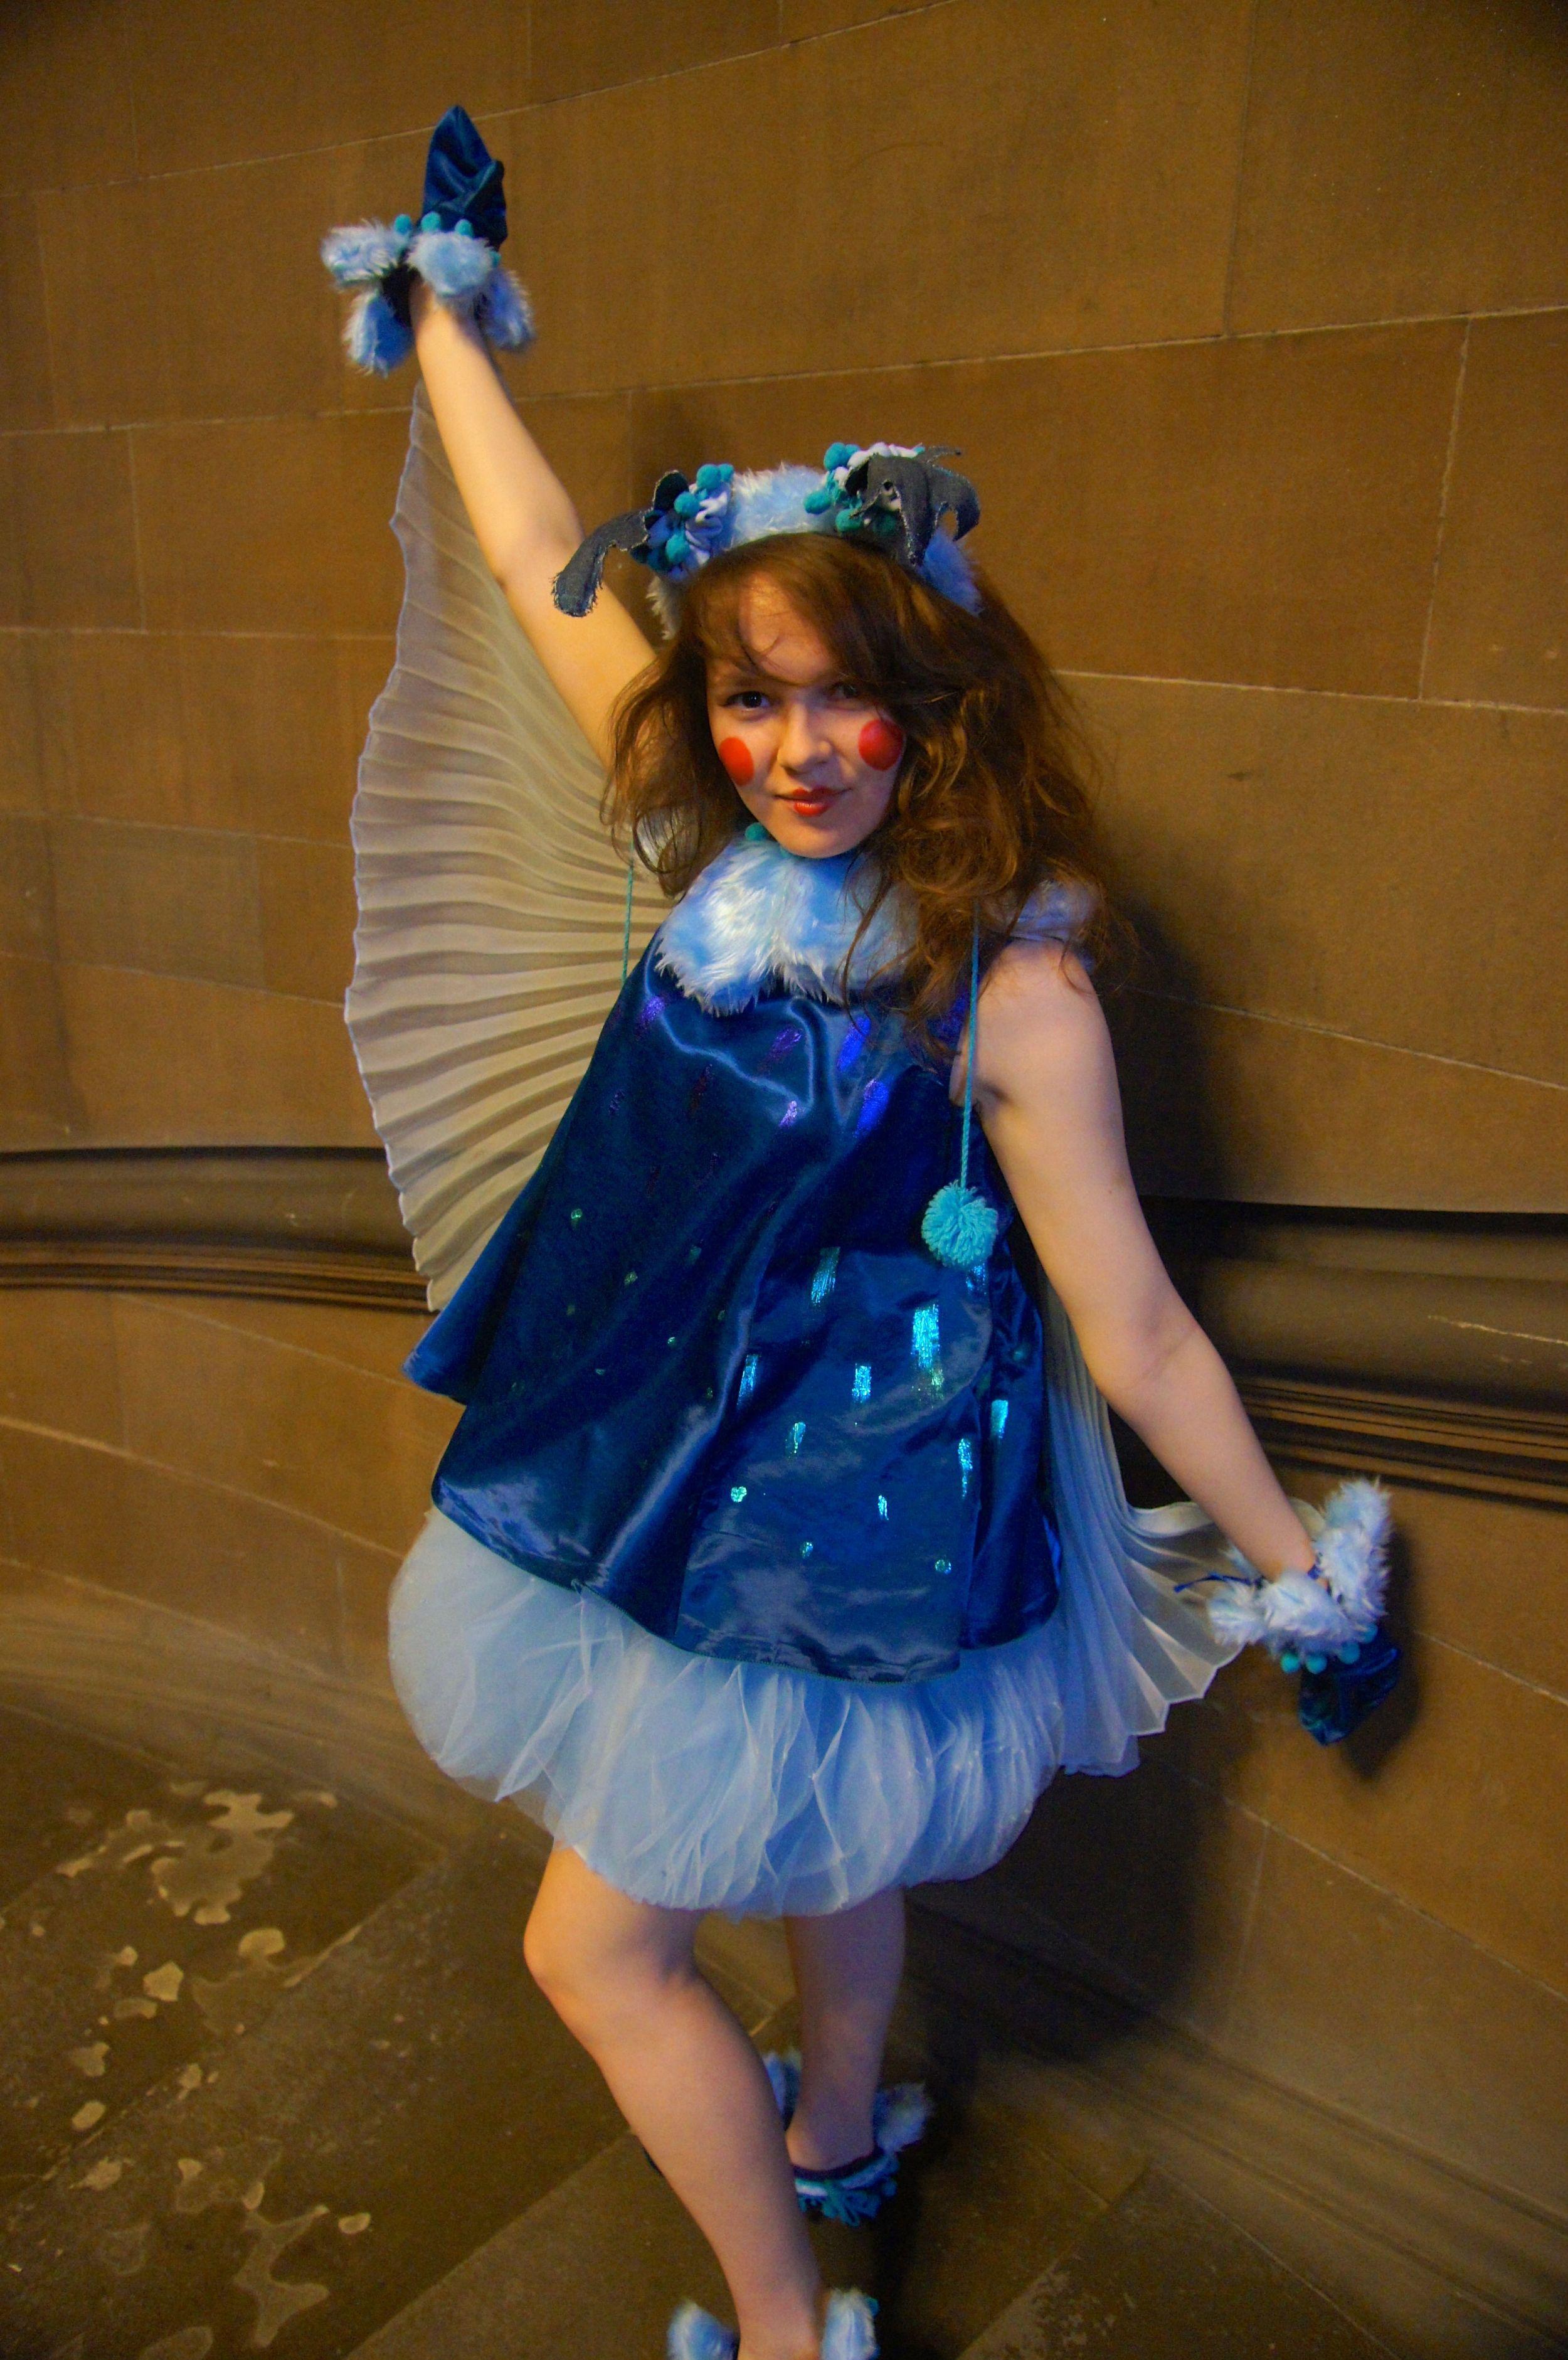 Sniggle the Sky Squig costume